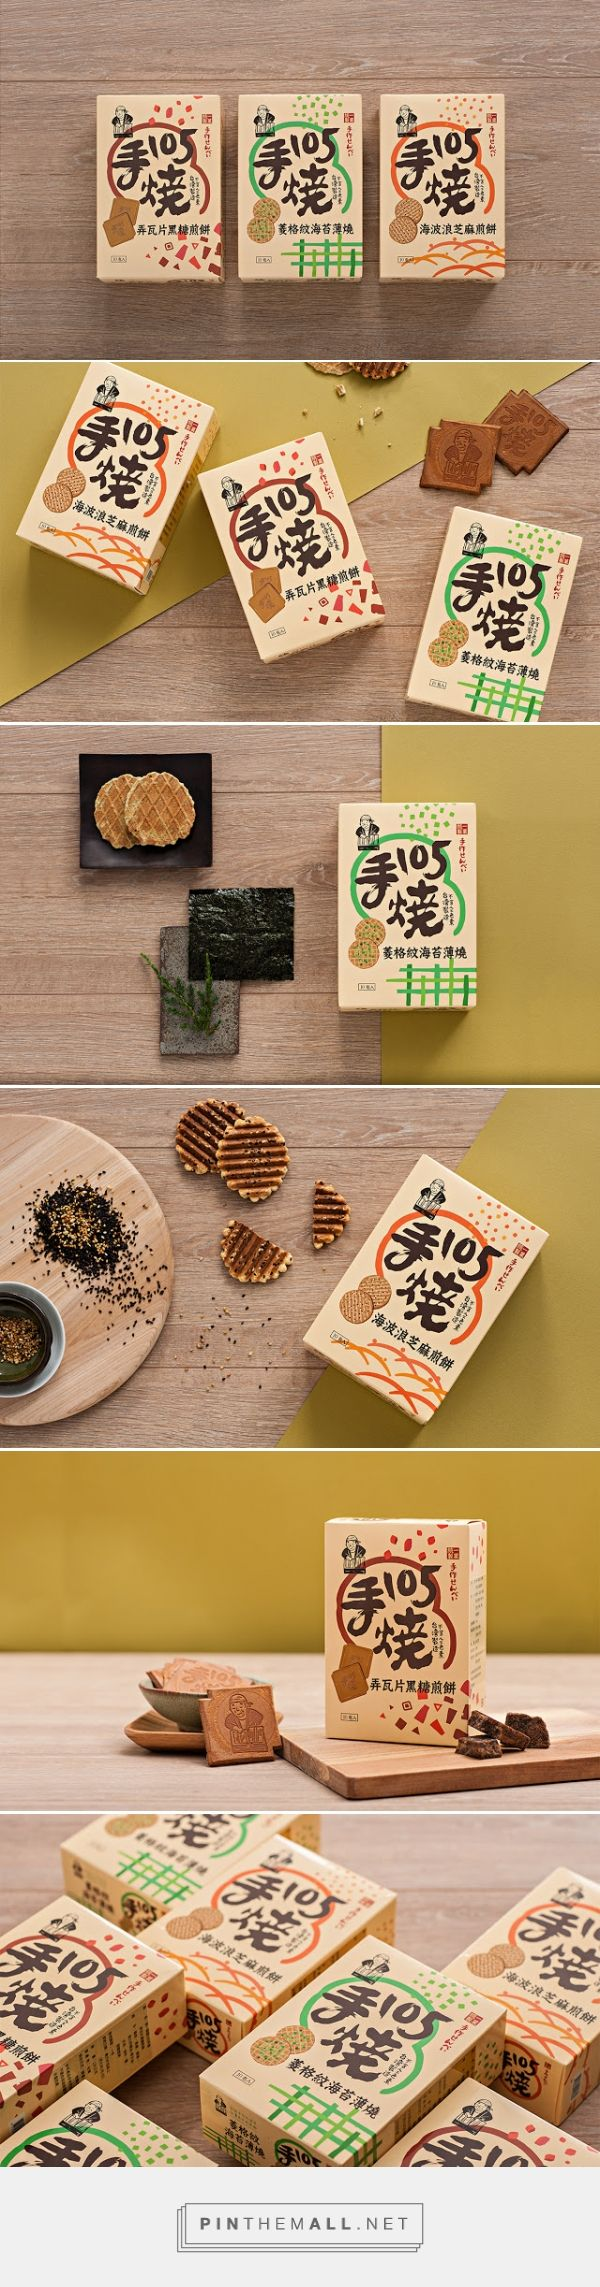 105 Handmade Cookies packaging designed by 60 DEGREE (Taiwan) - http://www.packagingoftheworld.com/2016/01/105-handmade-cookies.html